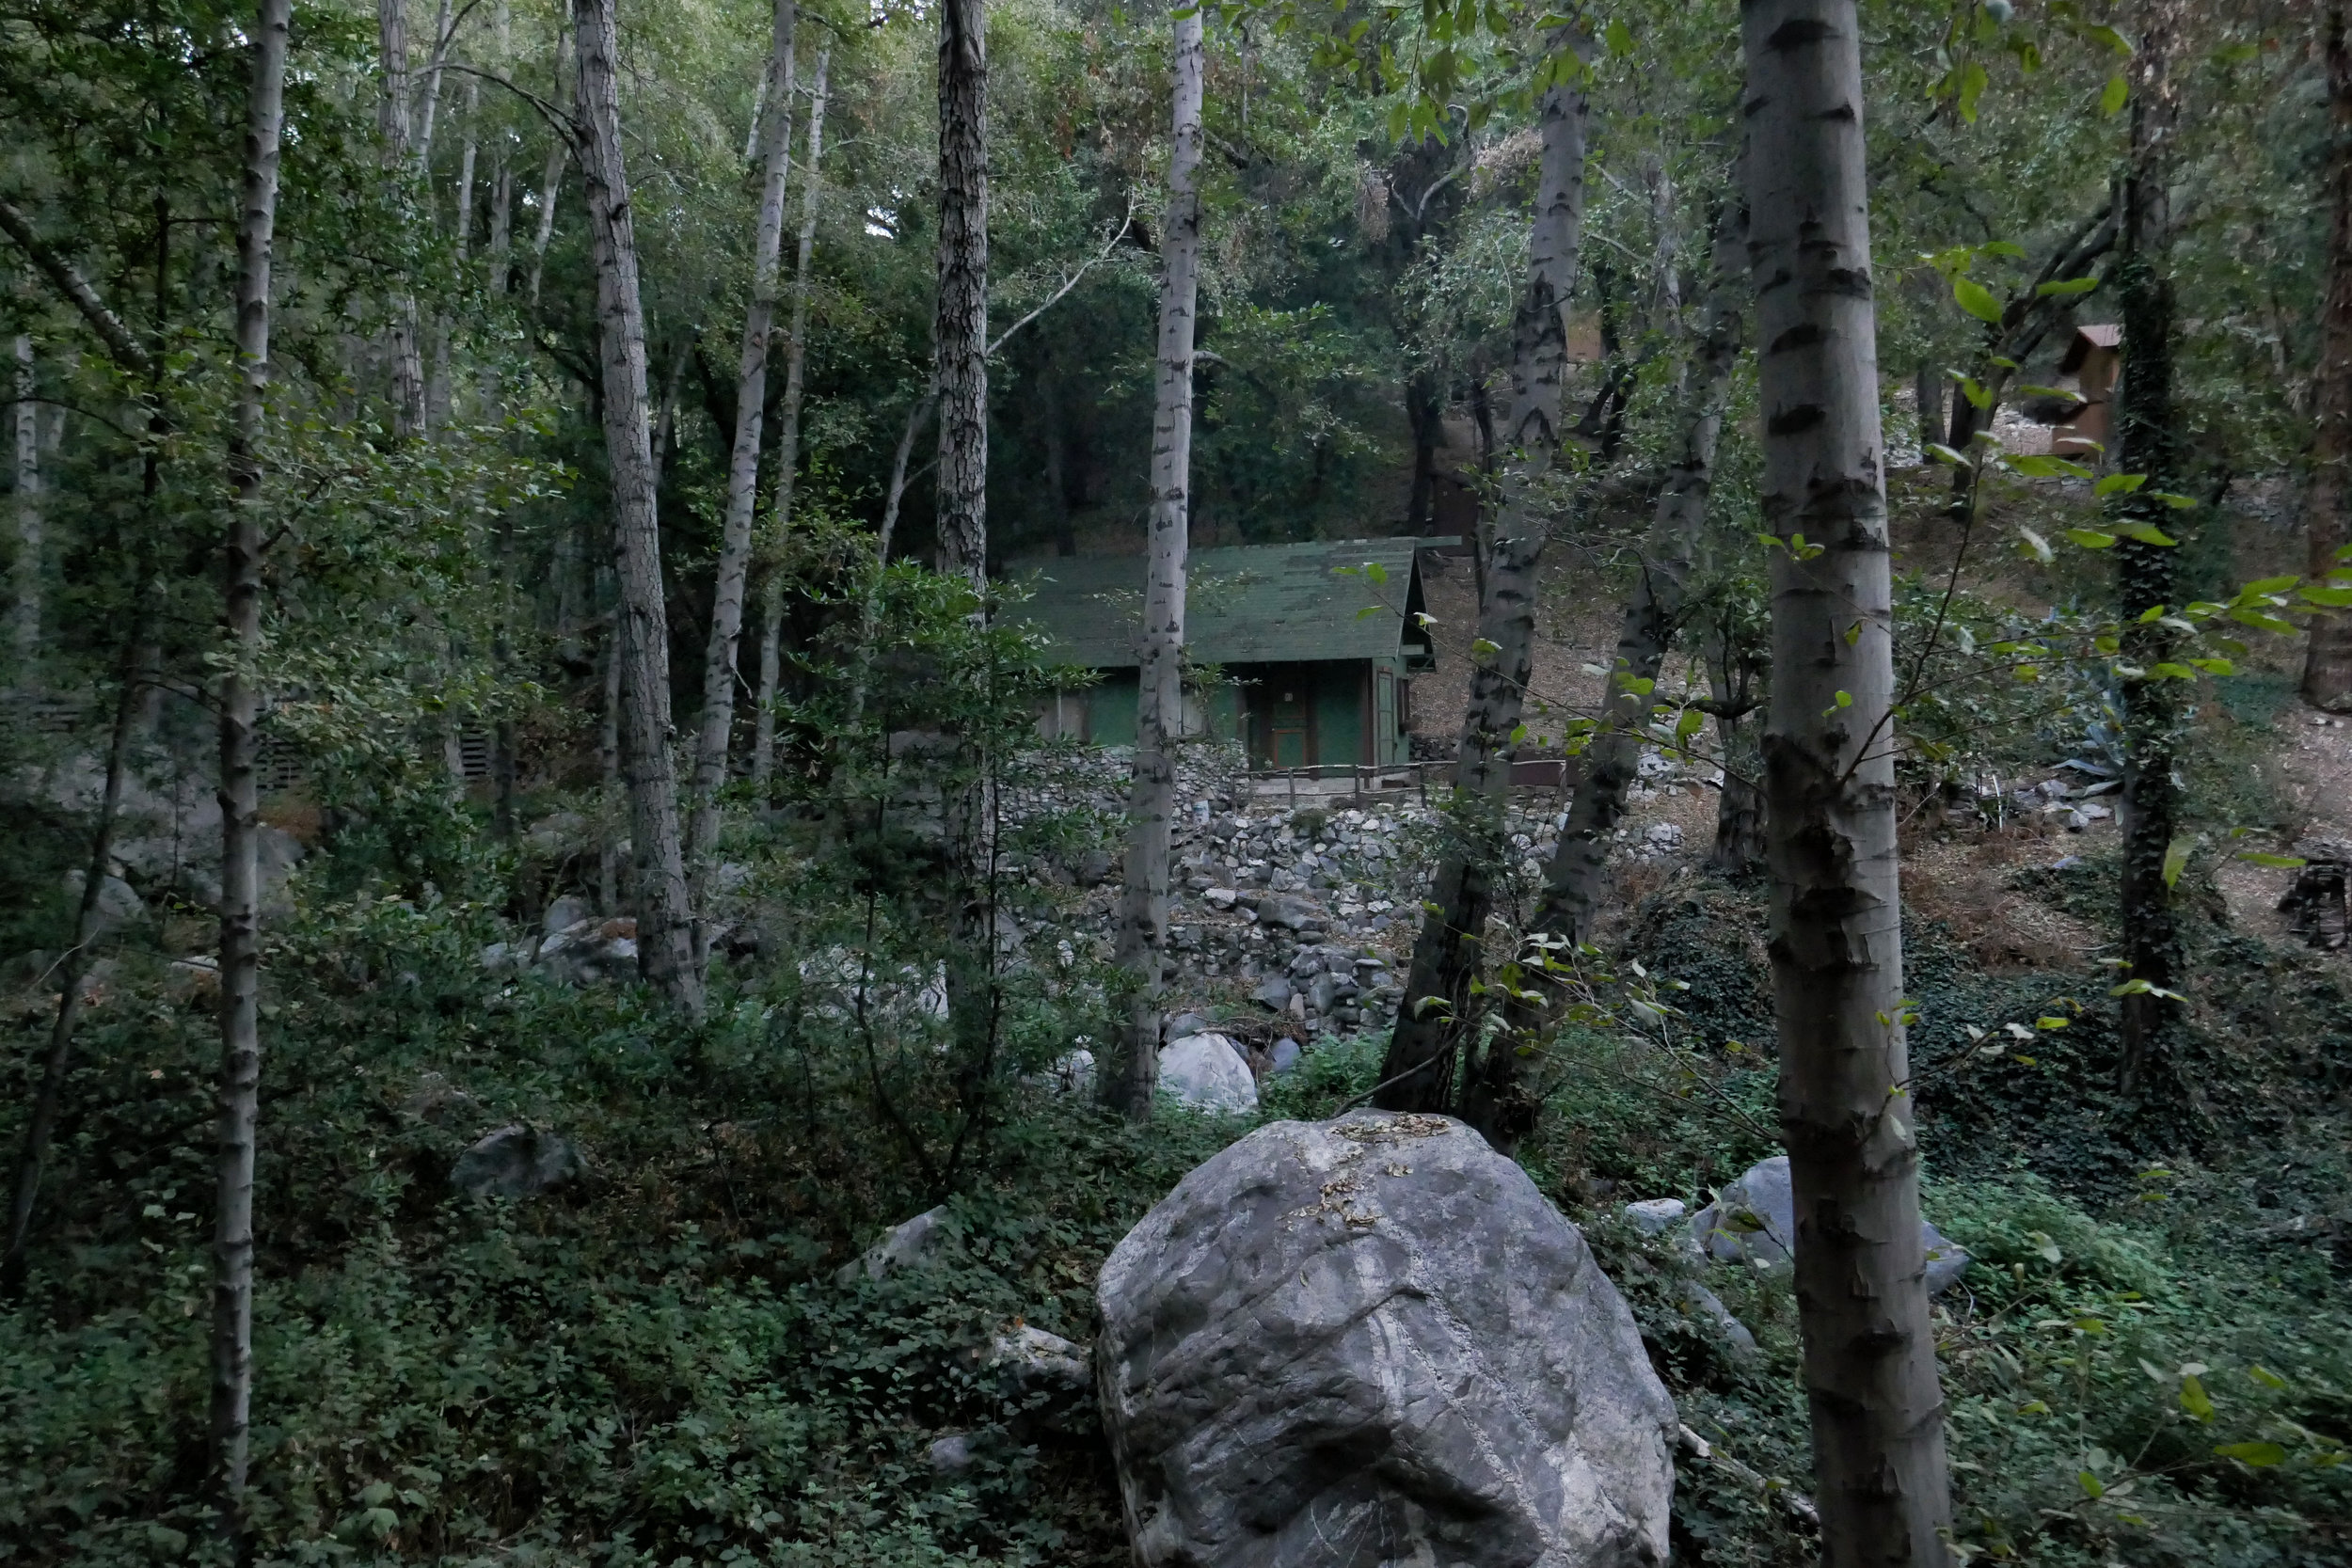 Beautiful historic cabins along the creek.